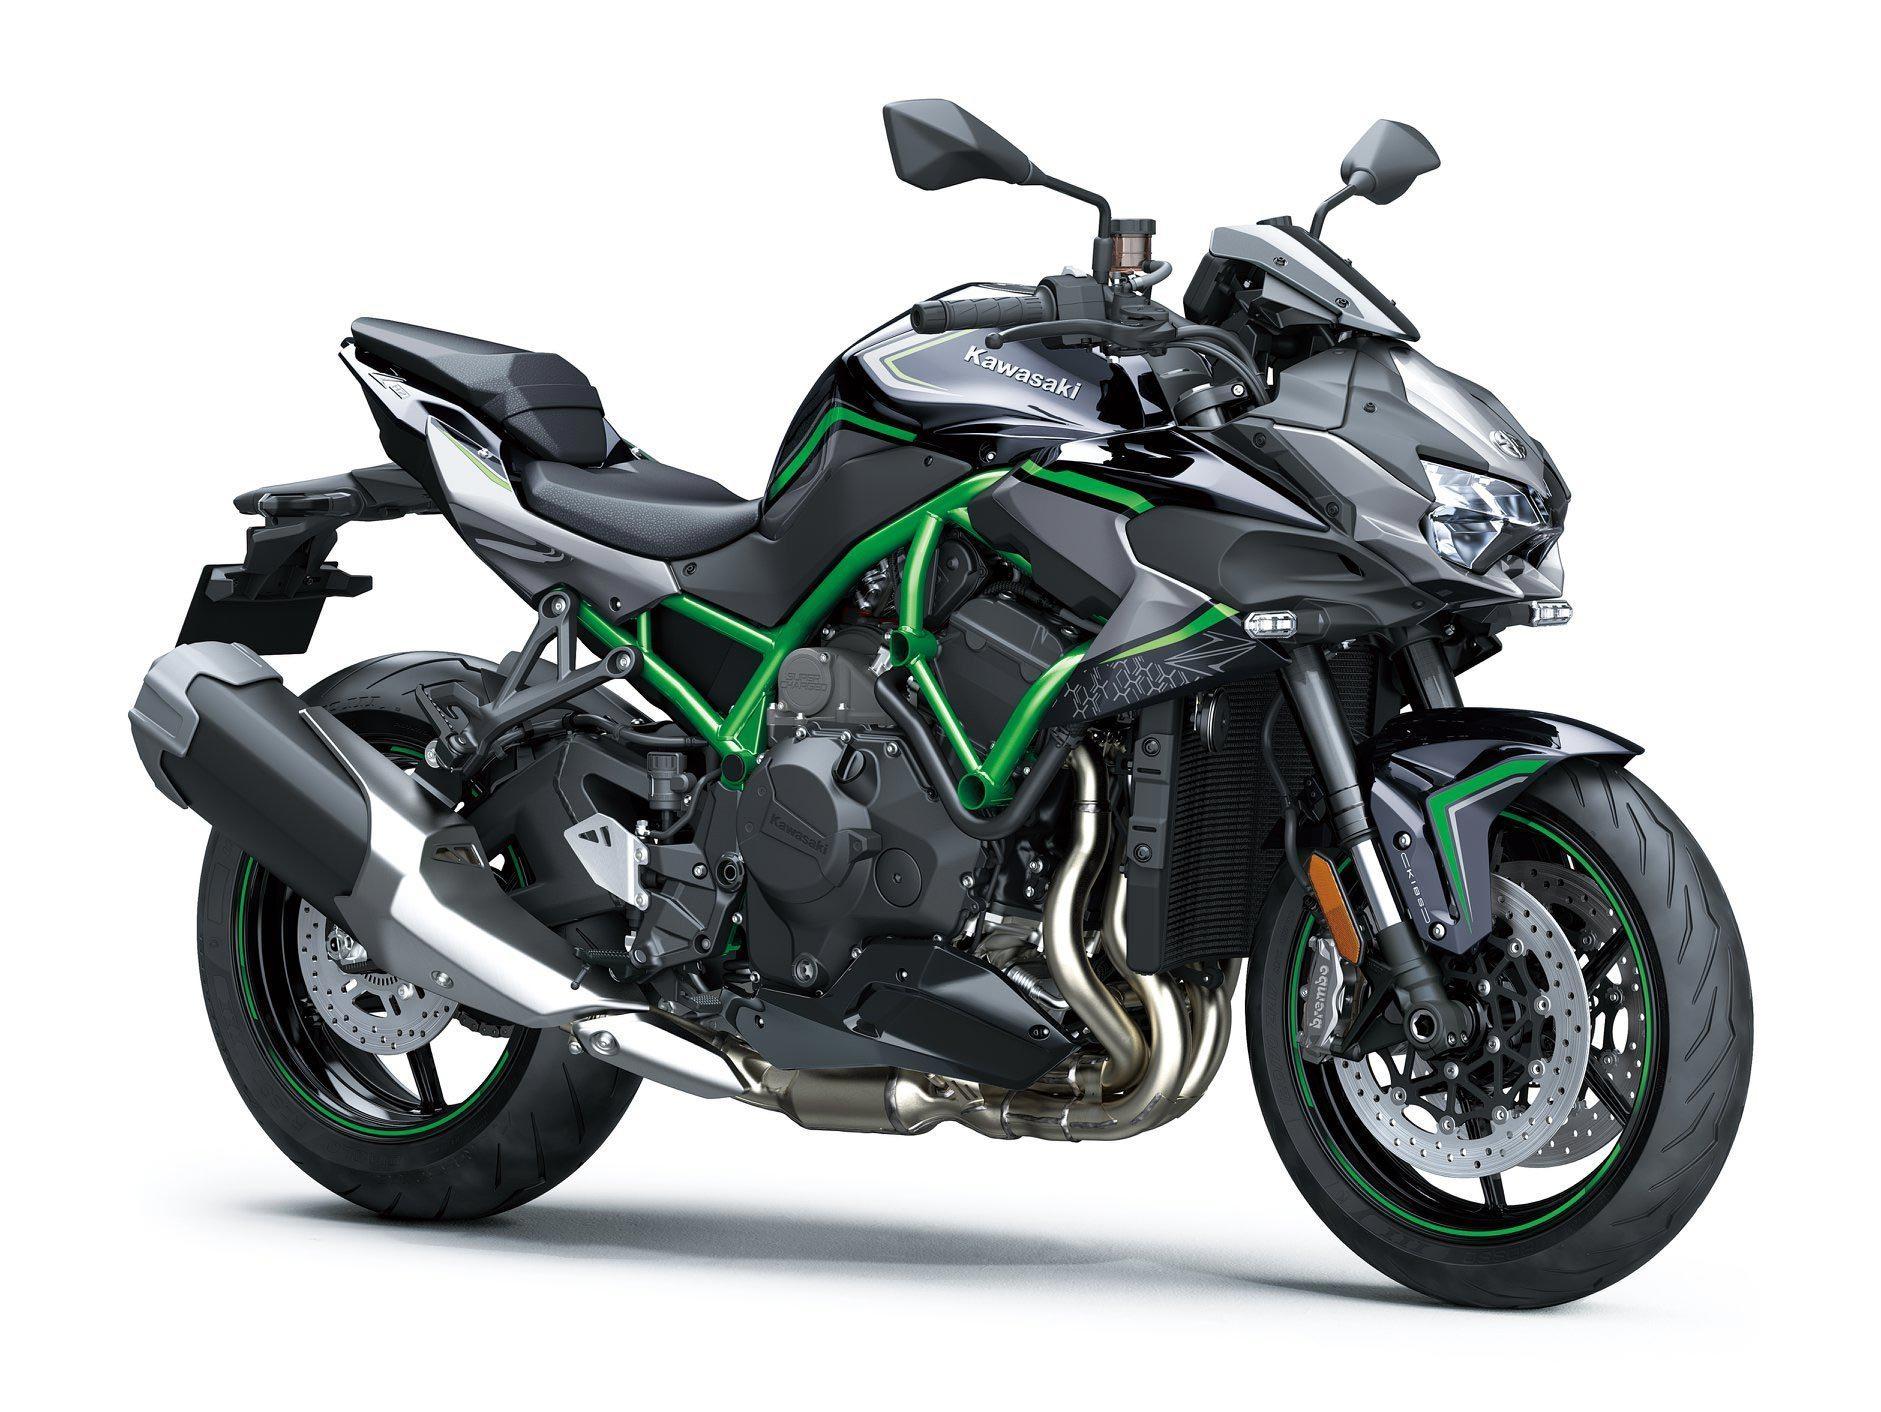 Kawasaki Z H2 2020 Review, Specs, Price & Gallery